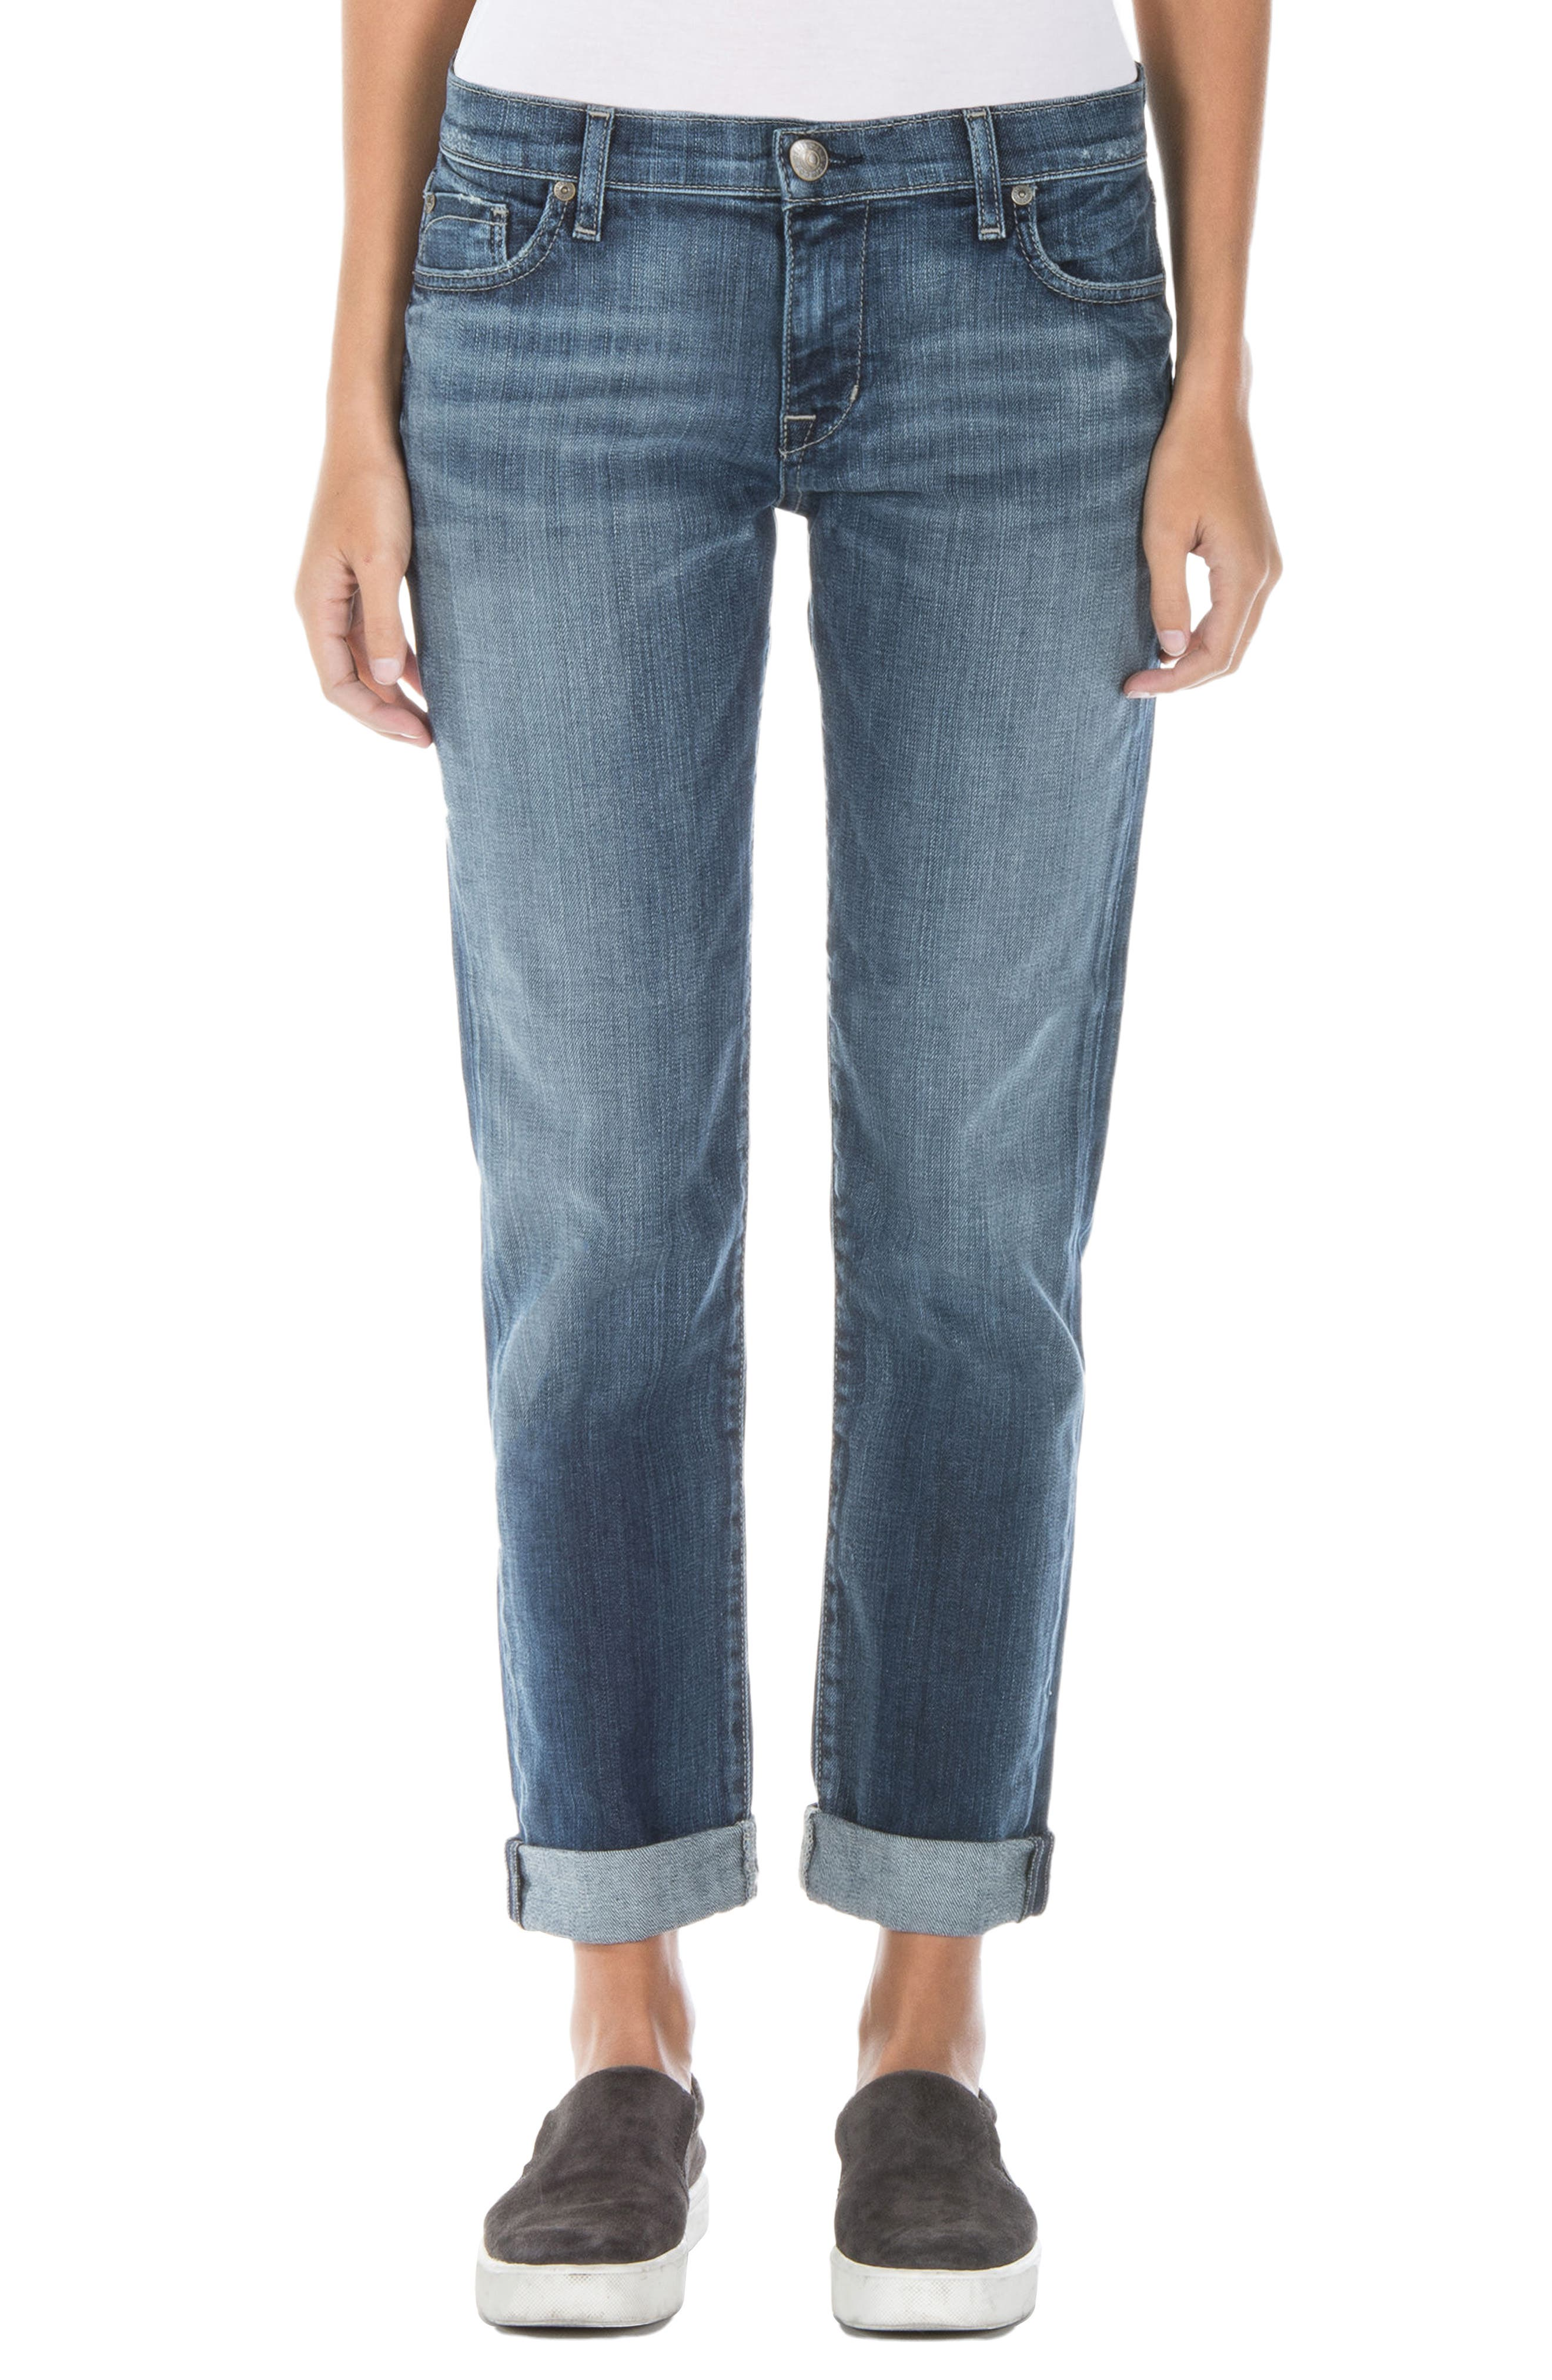 Main Image - Fidelity Denim Axl Girlfriend Jeans (Exile Vintage)